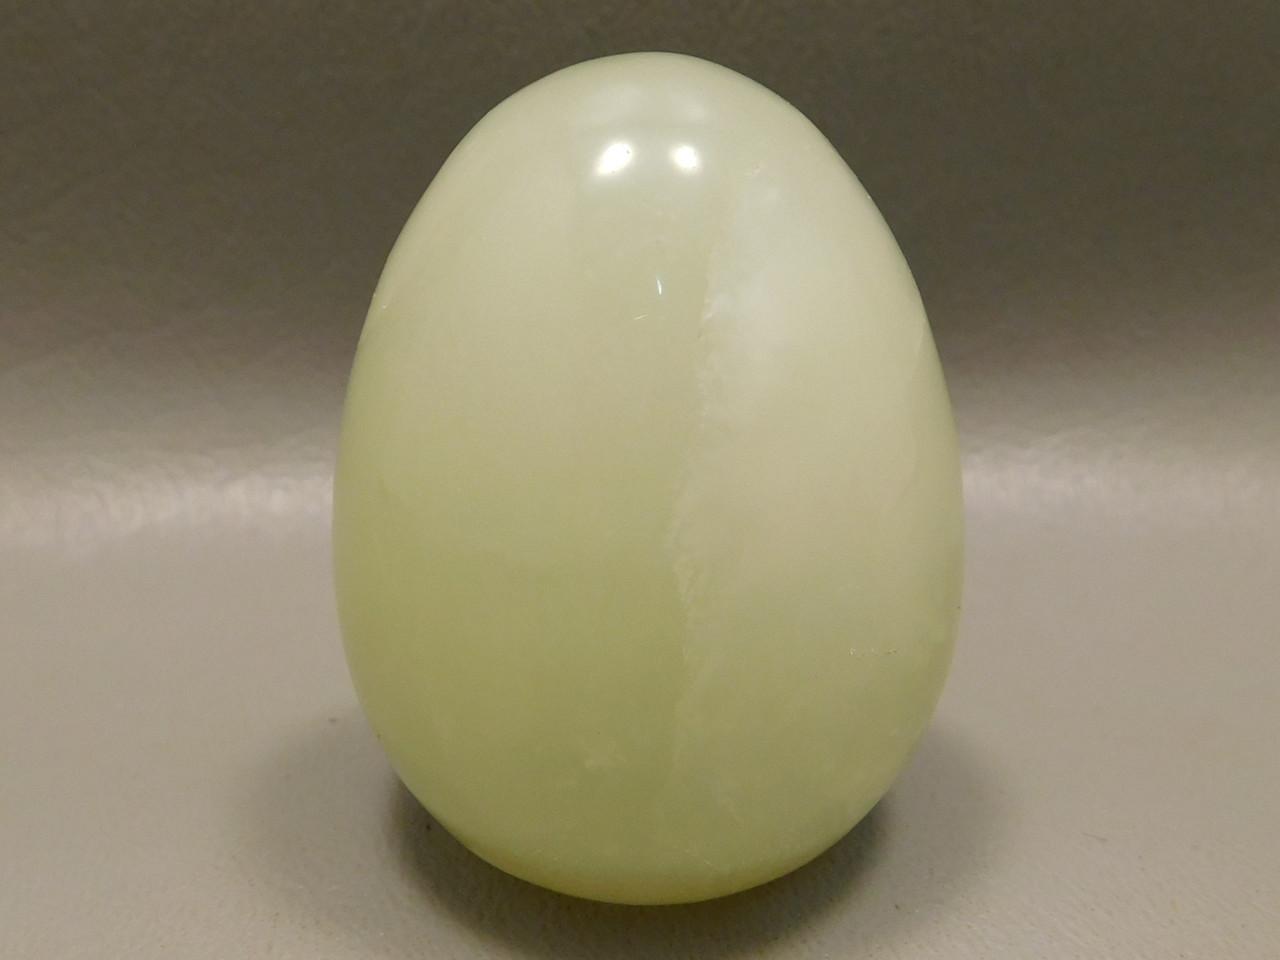 Serpentine Stone Egg 2 inch Yellow Green Gemstone Rock New Jade #O2